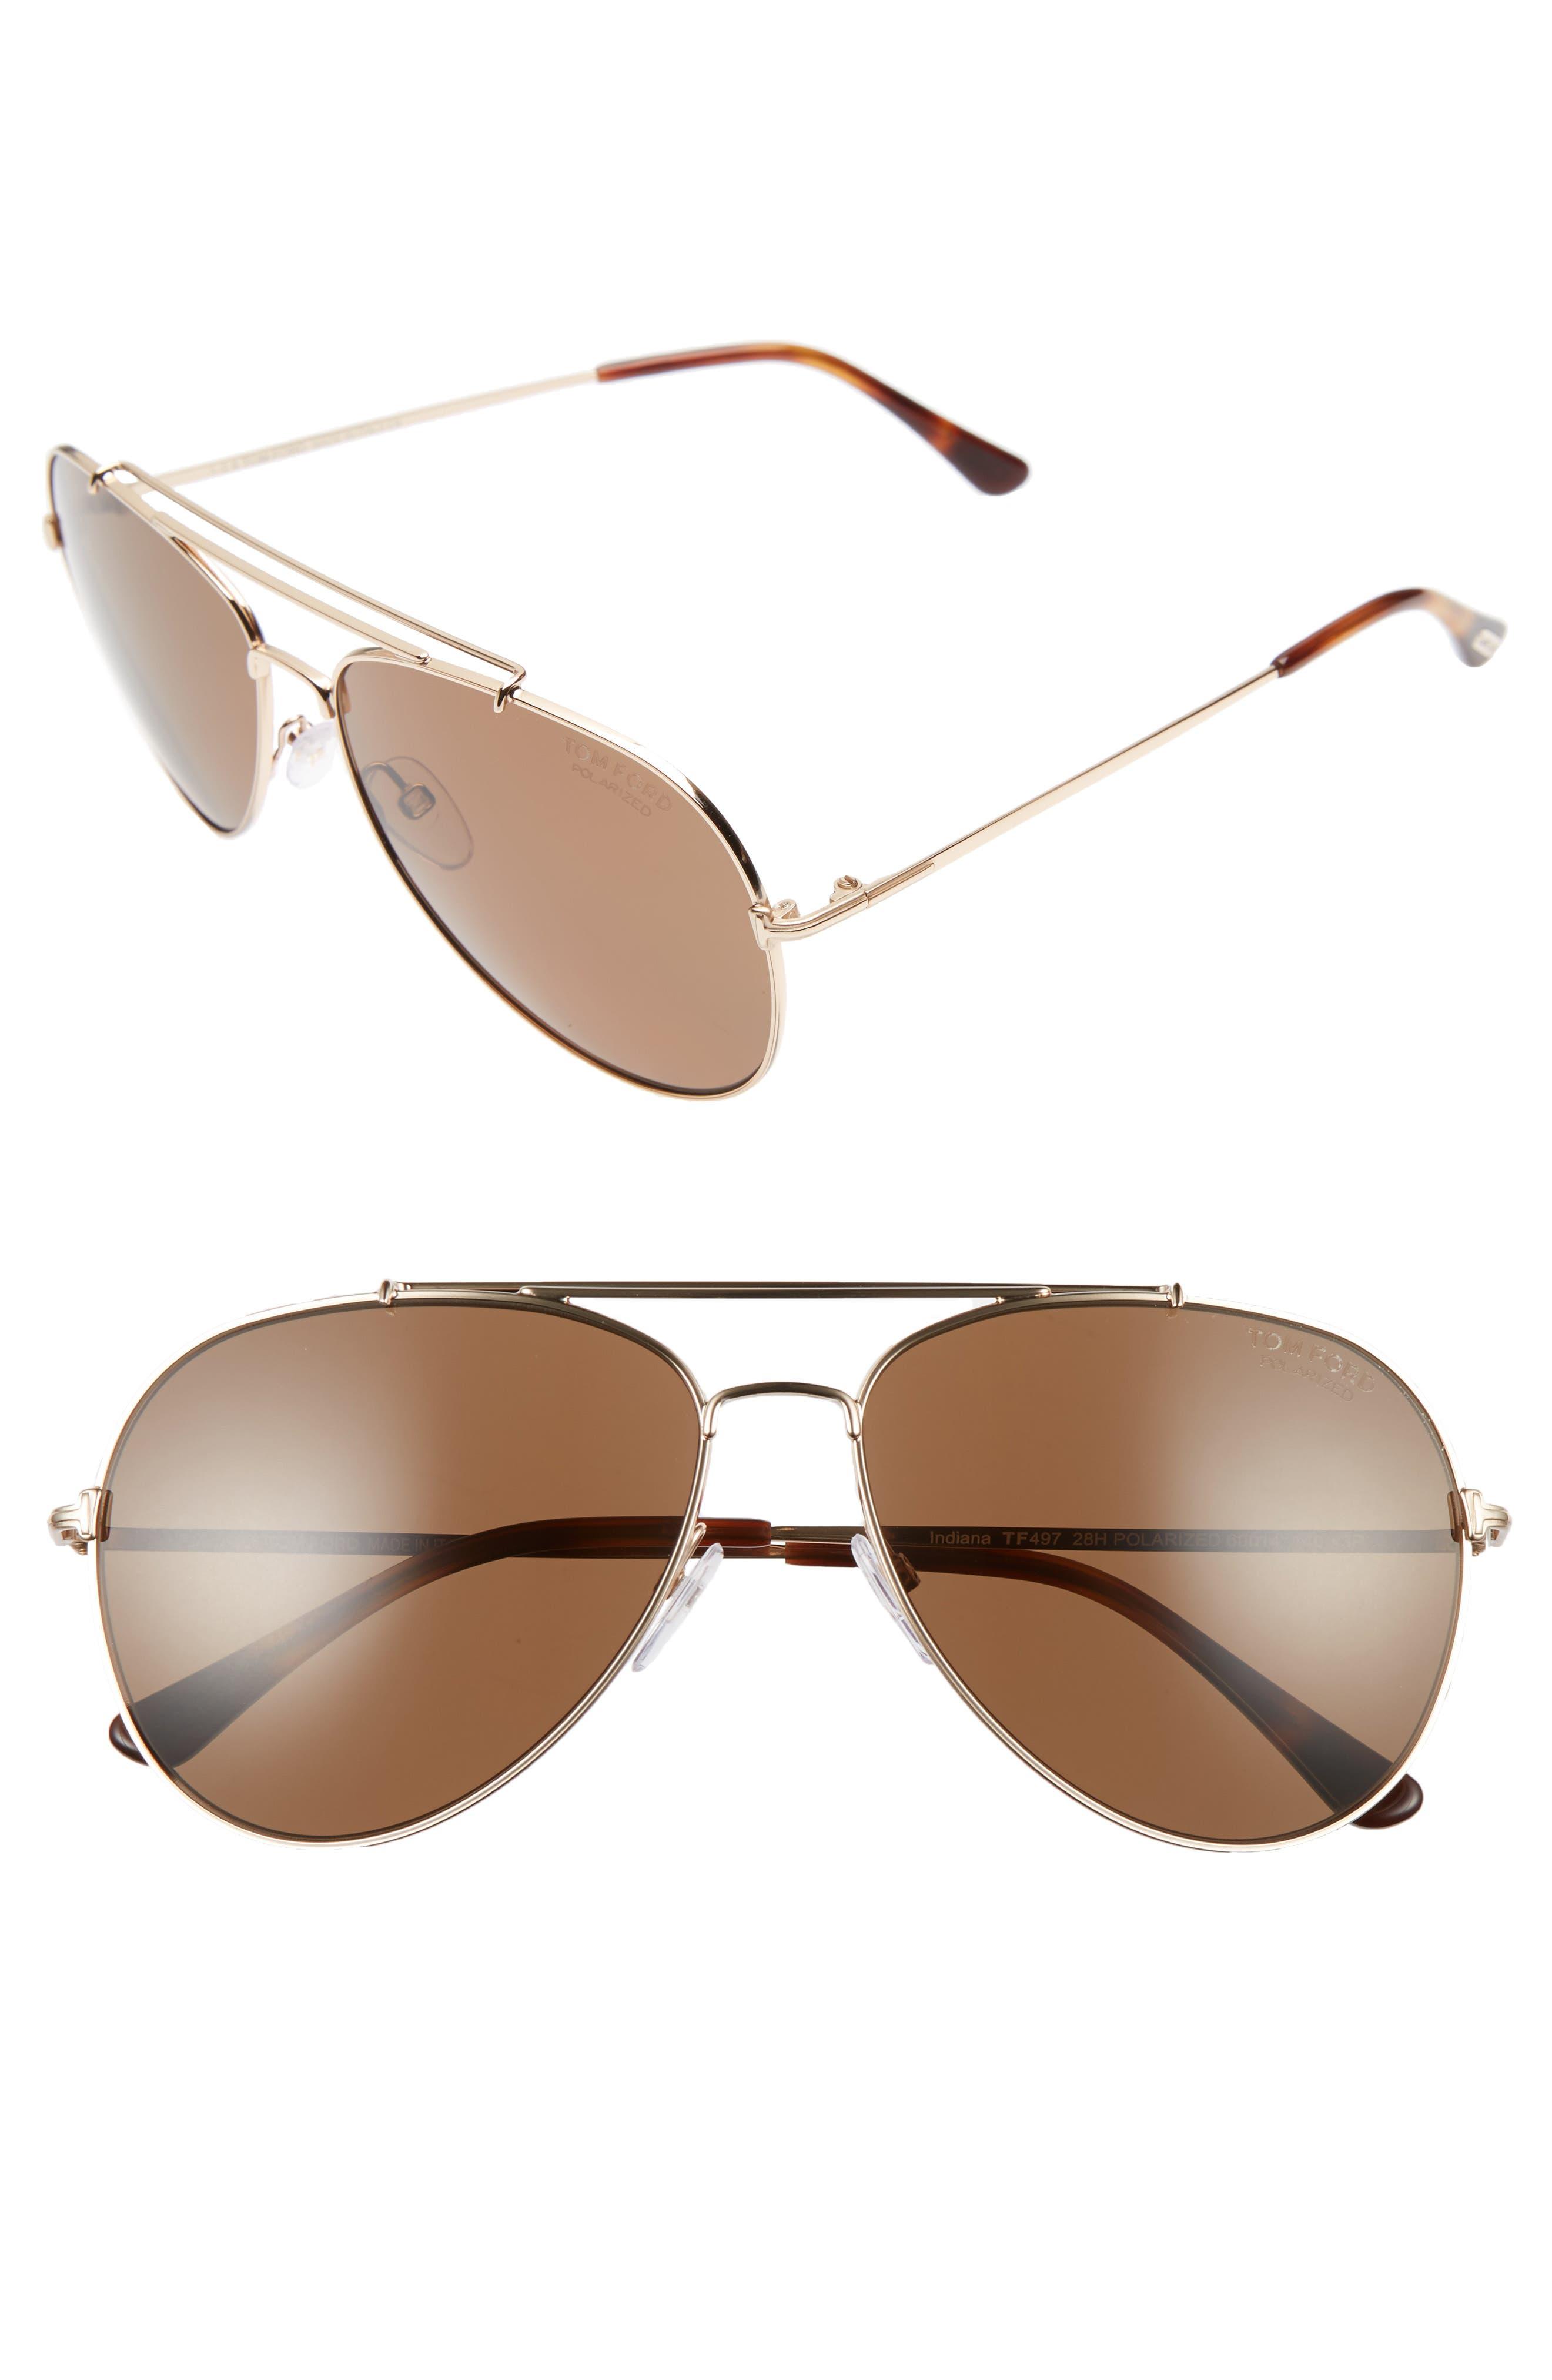 Main Image - Tom Ford Indiana 58mm Polarized Aviator Sunglasses